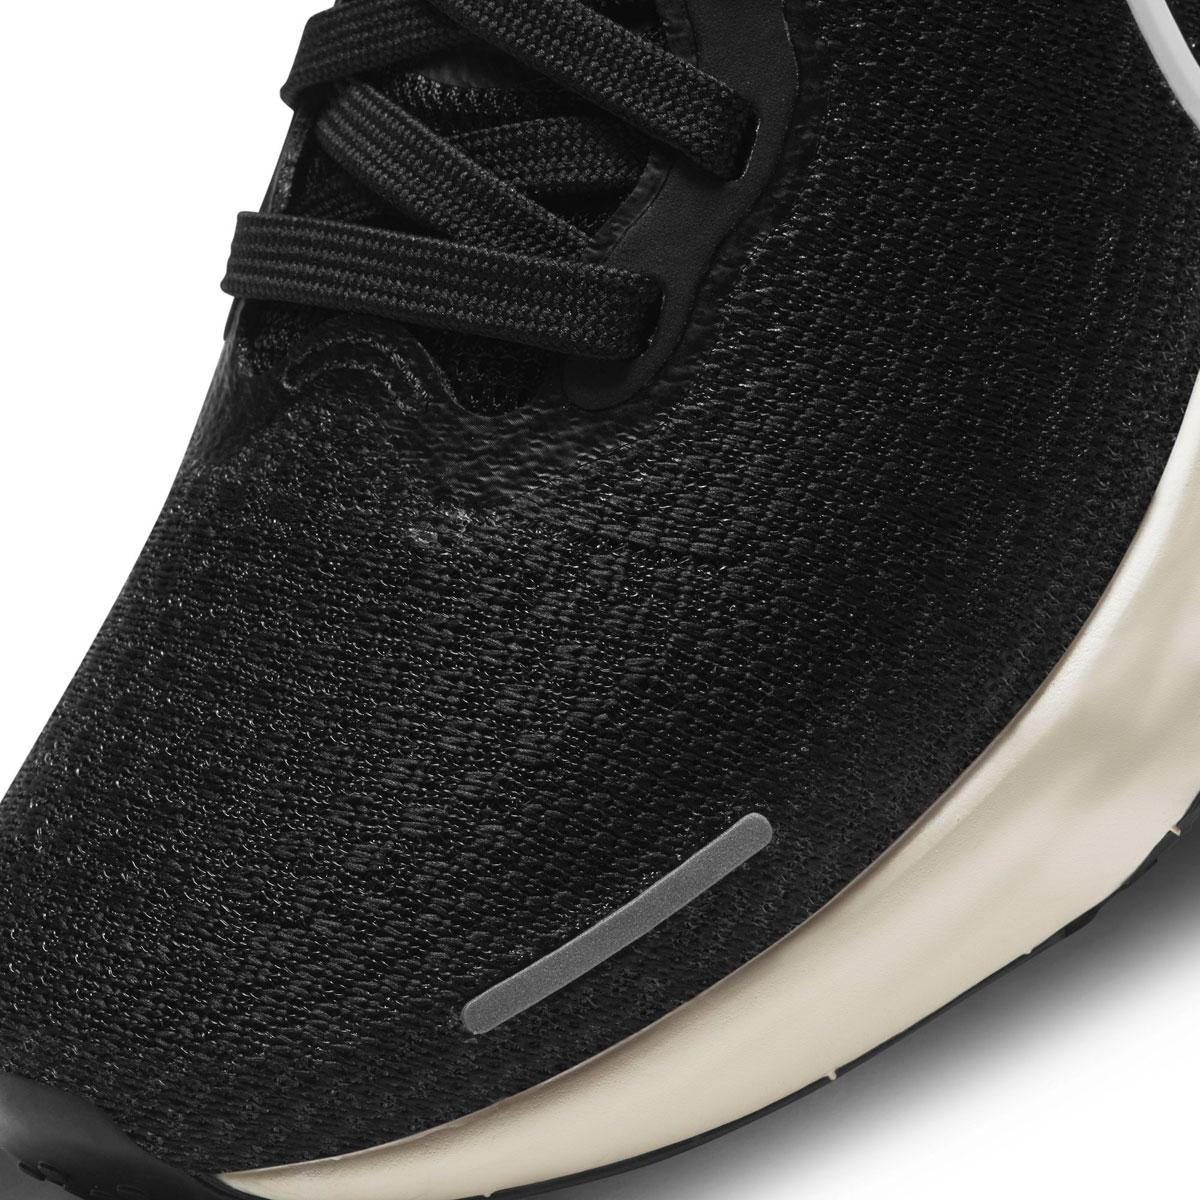 Women's Nike Zoomx Invincible Run FlyKnit Running Shoe - Color: Black/White/Iron Grey - Size: 5 - Width: Regular, Black/White/Iron Grey, large, image 7